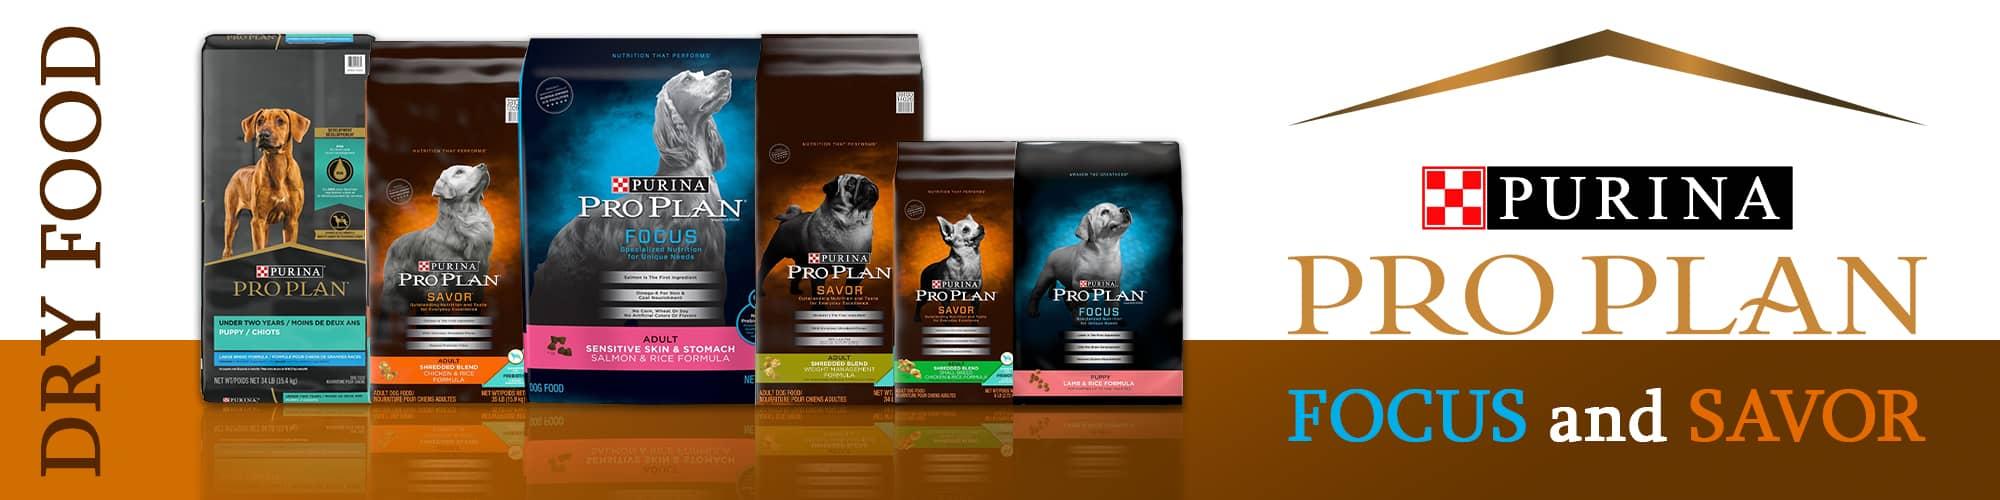 Purina Pro Plan Dog Food